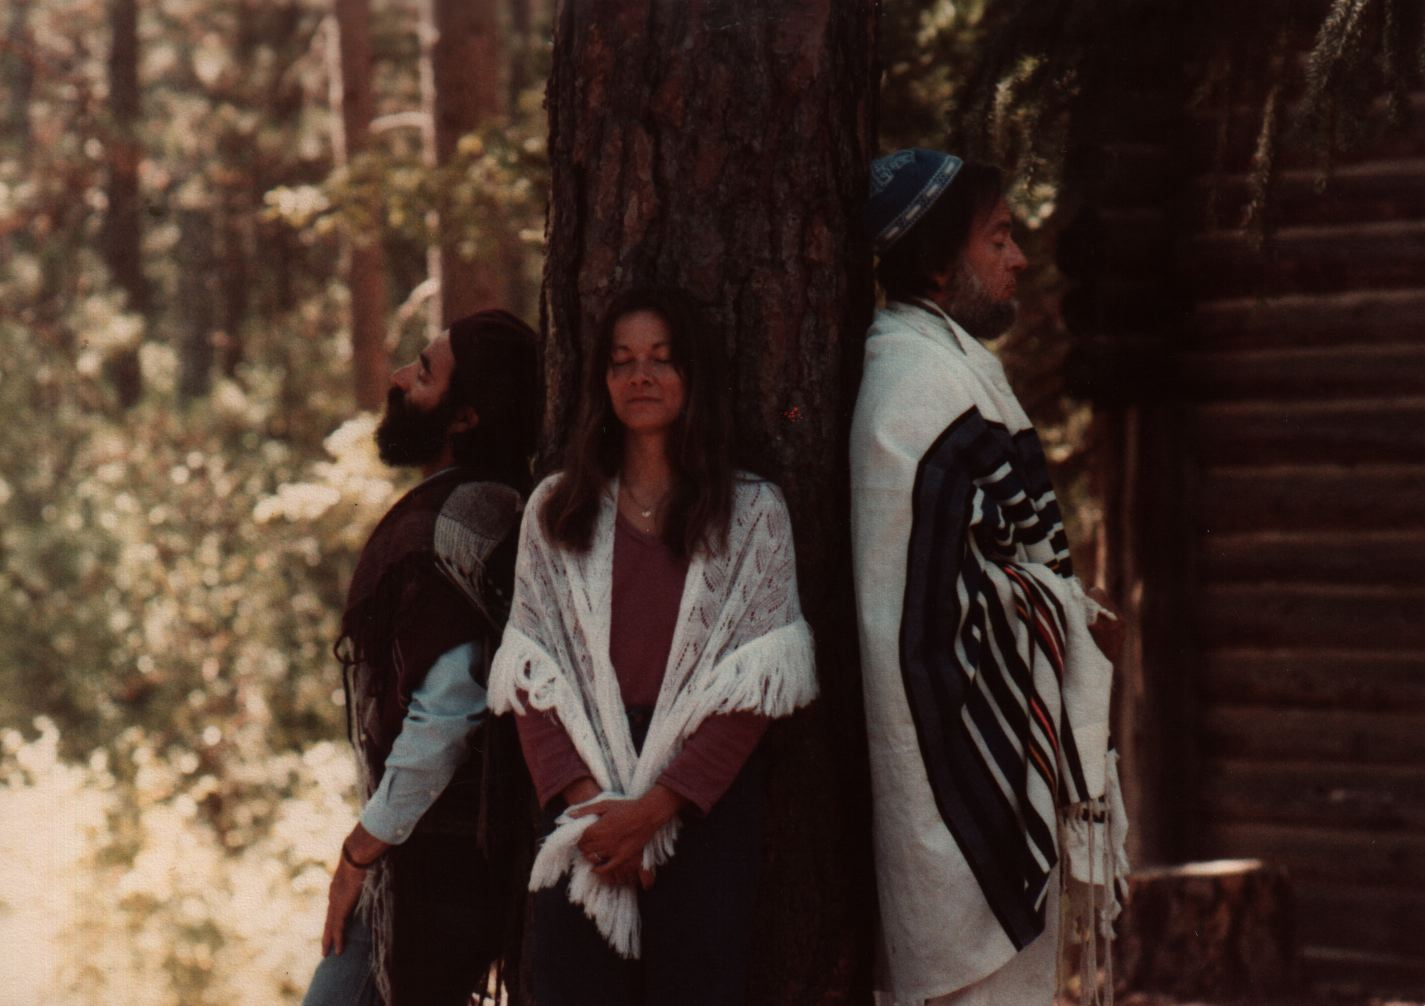 84 Joys Hanan Sills, Avraham Sand, and Windy Di Pietro davvening with backs to tree copy 2.jpg